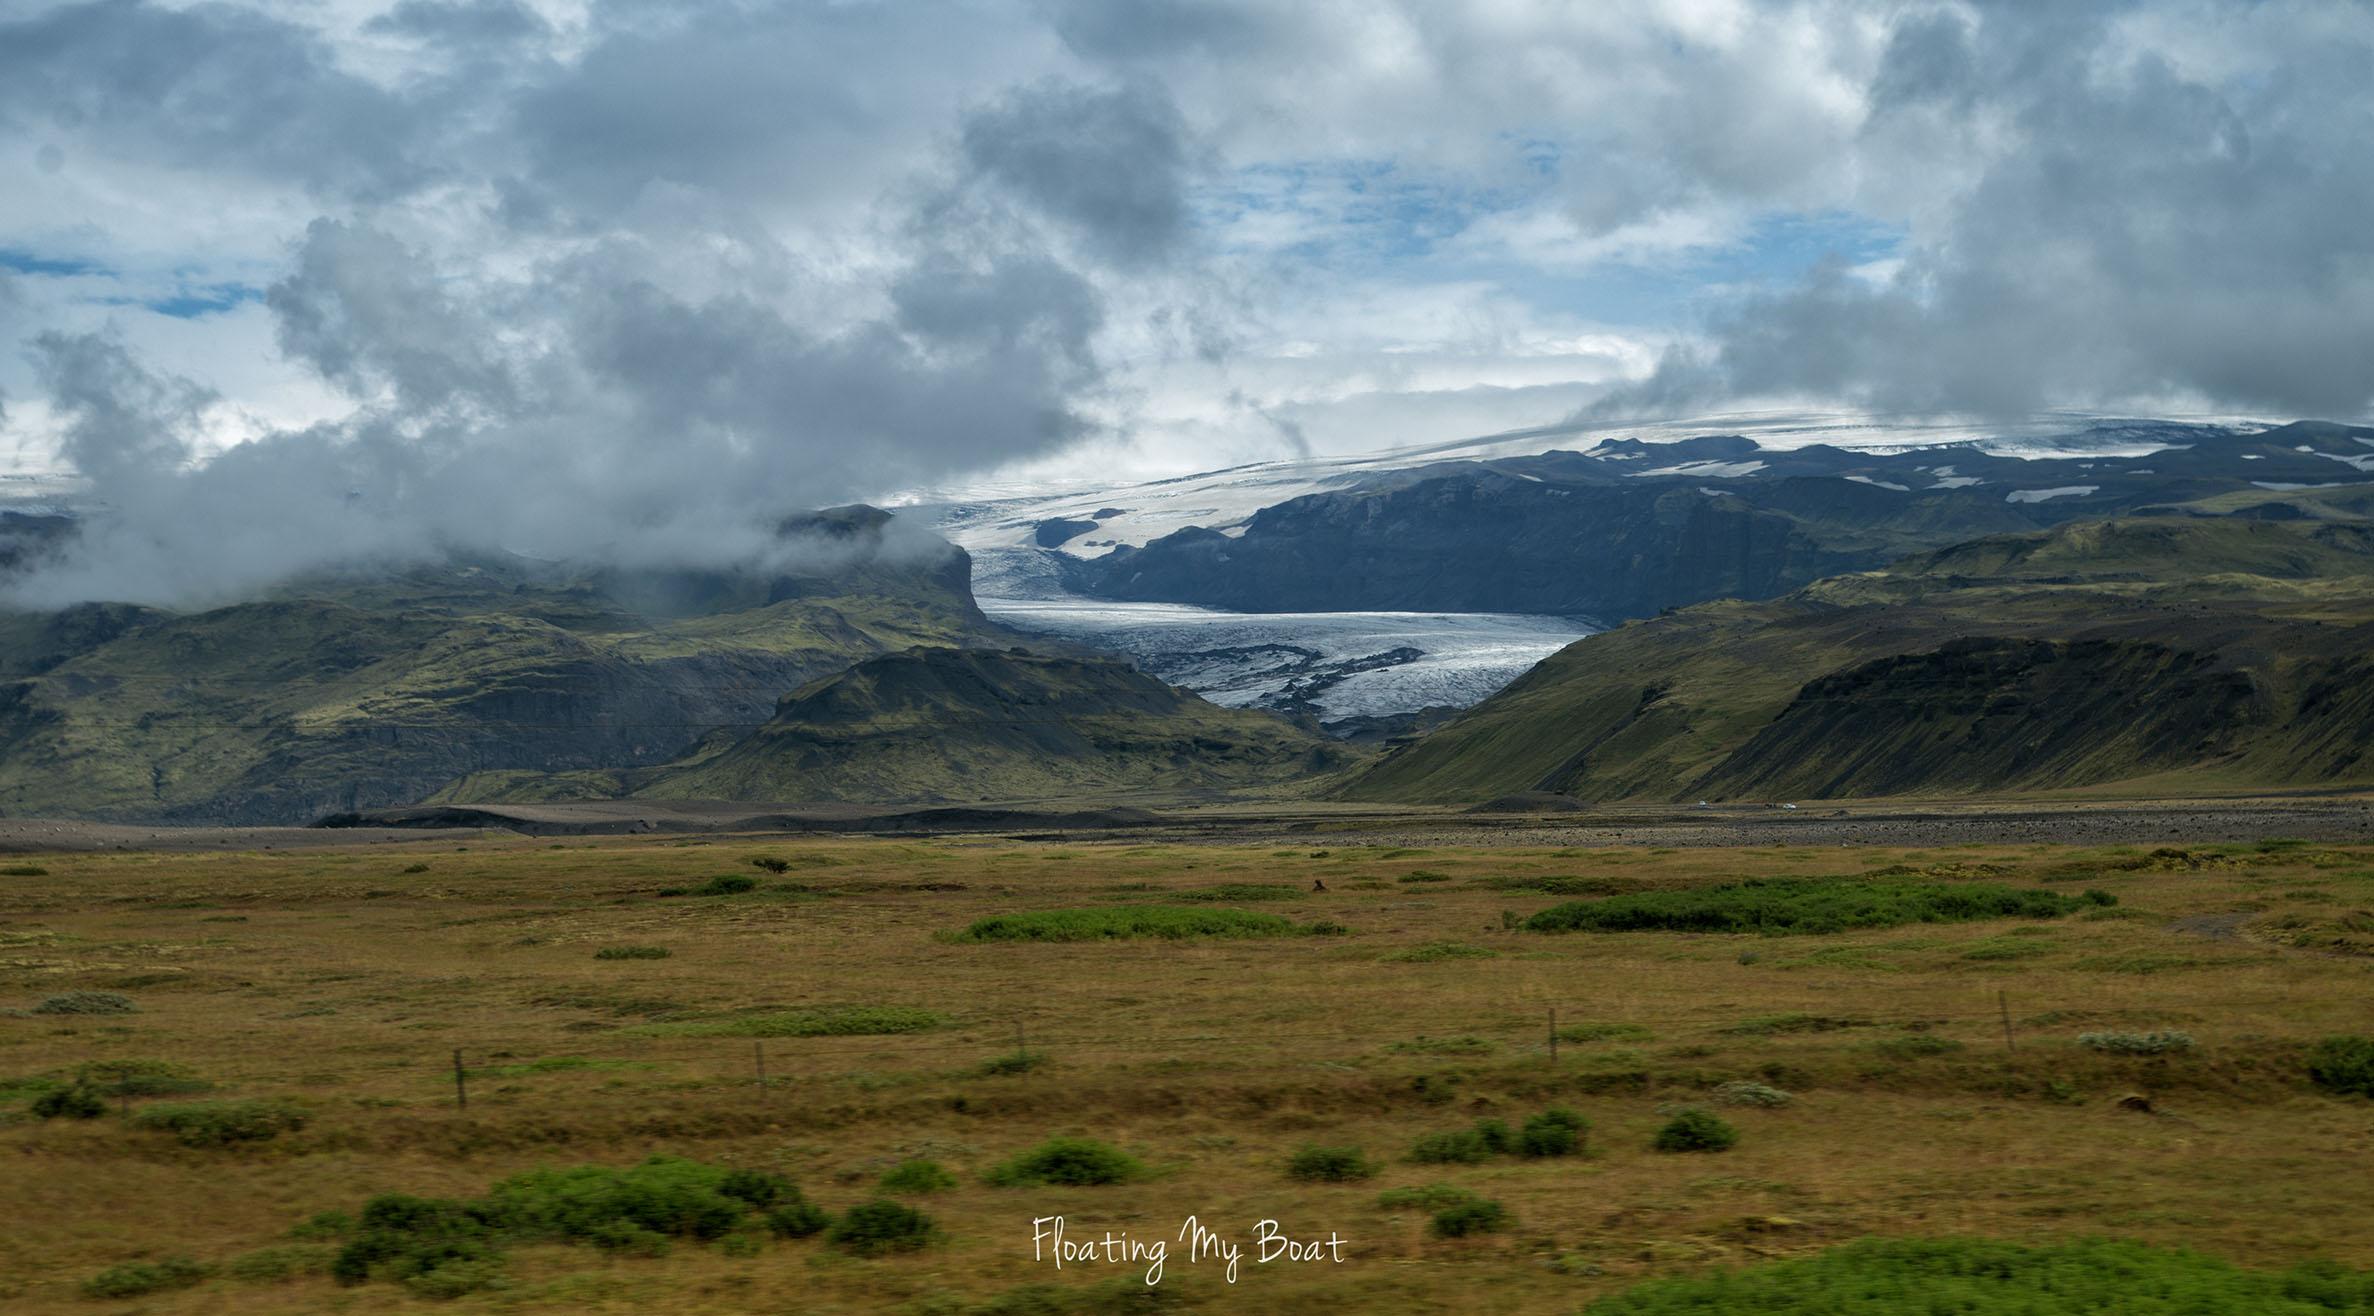 vatnajokull-iceland-trekking-day-one-3